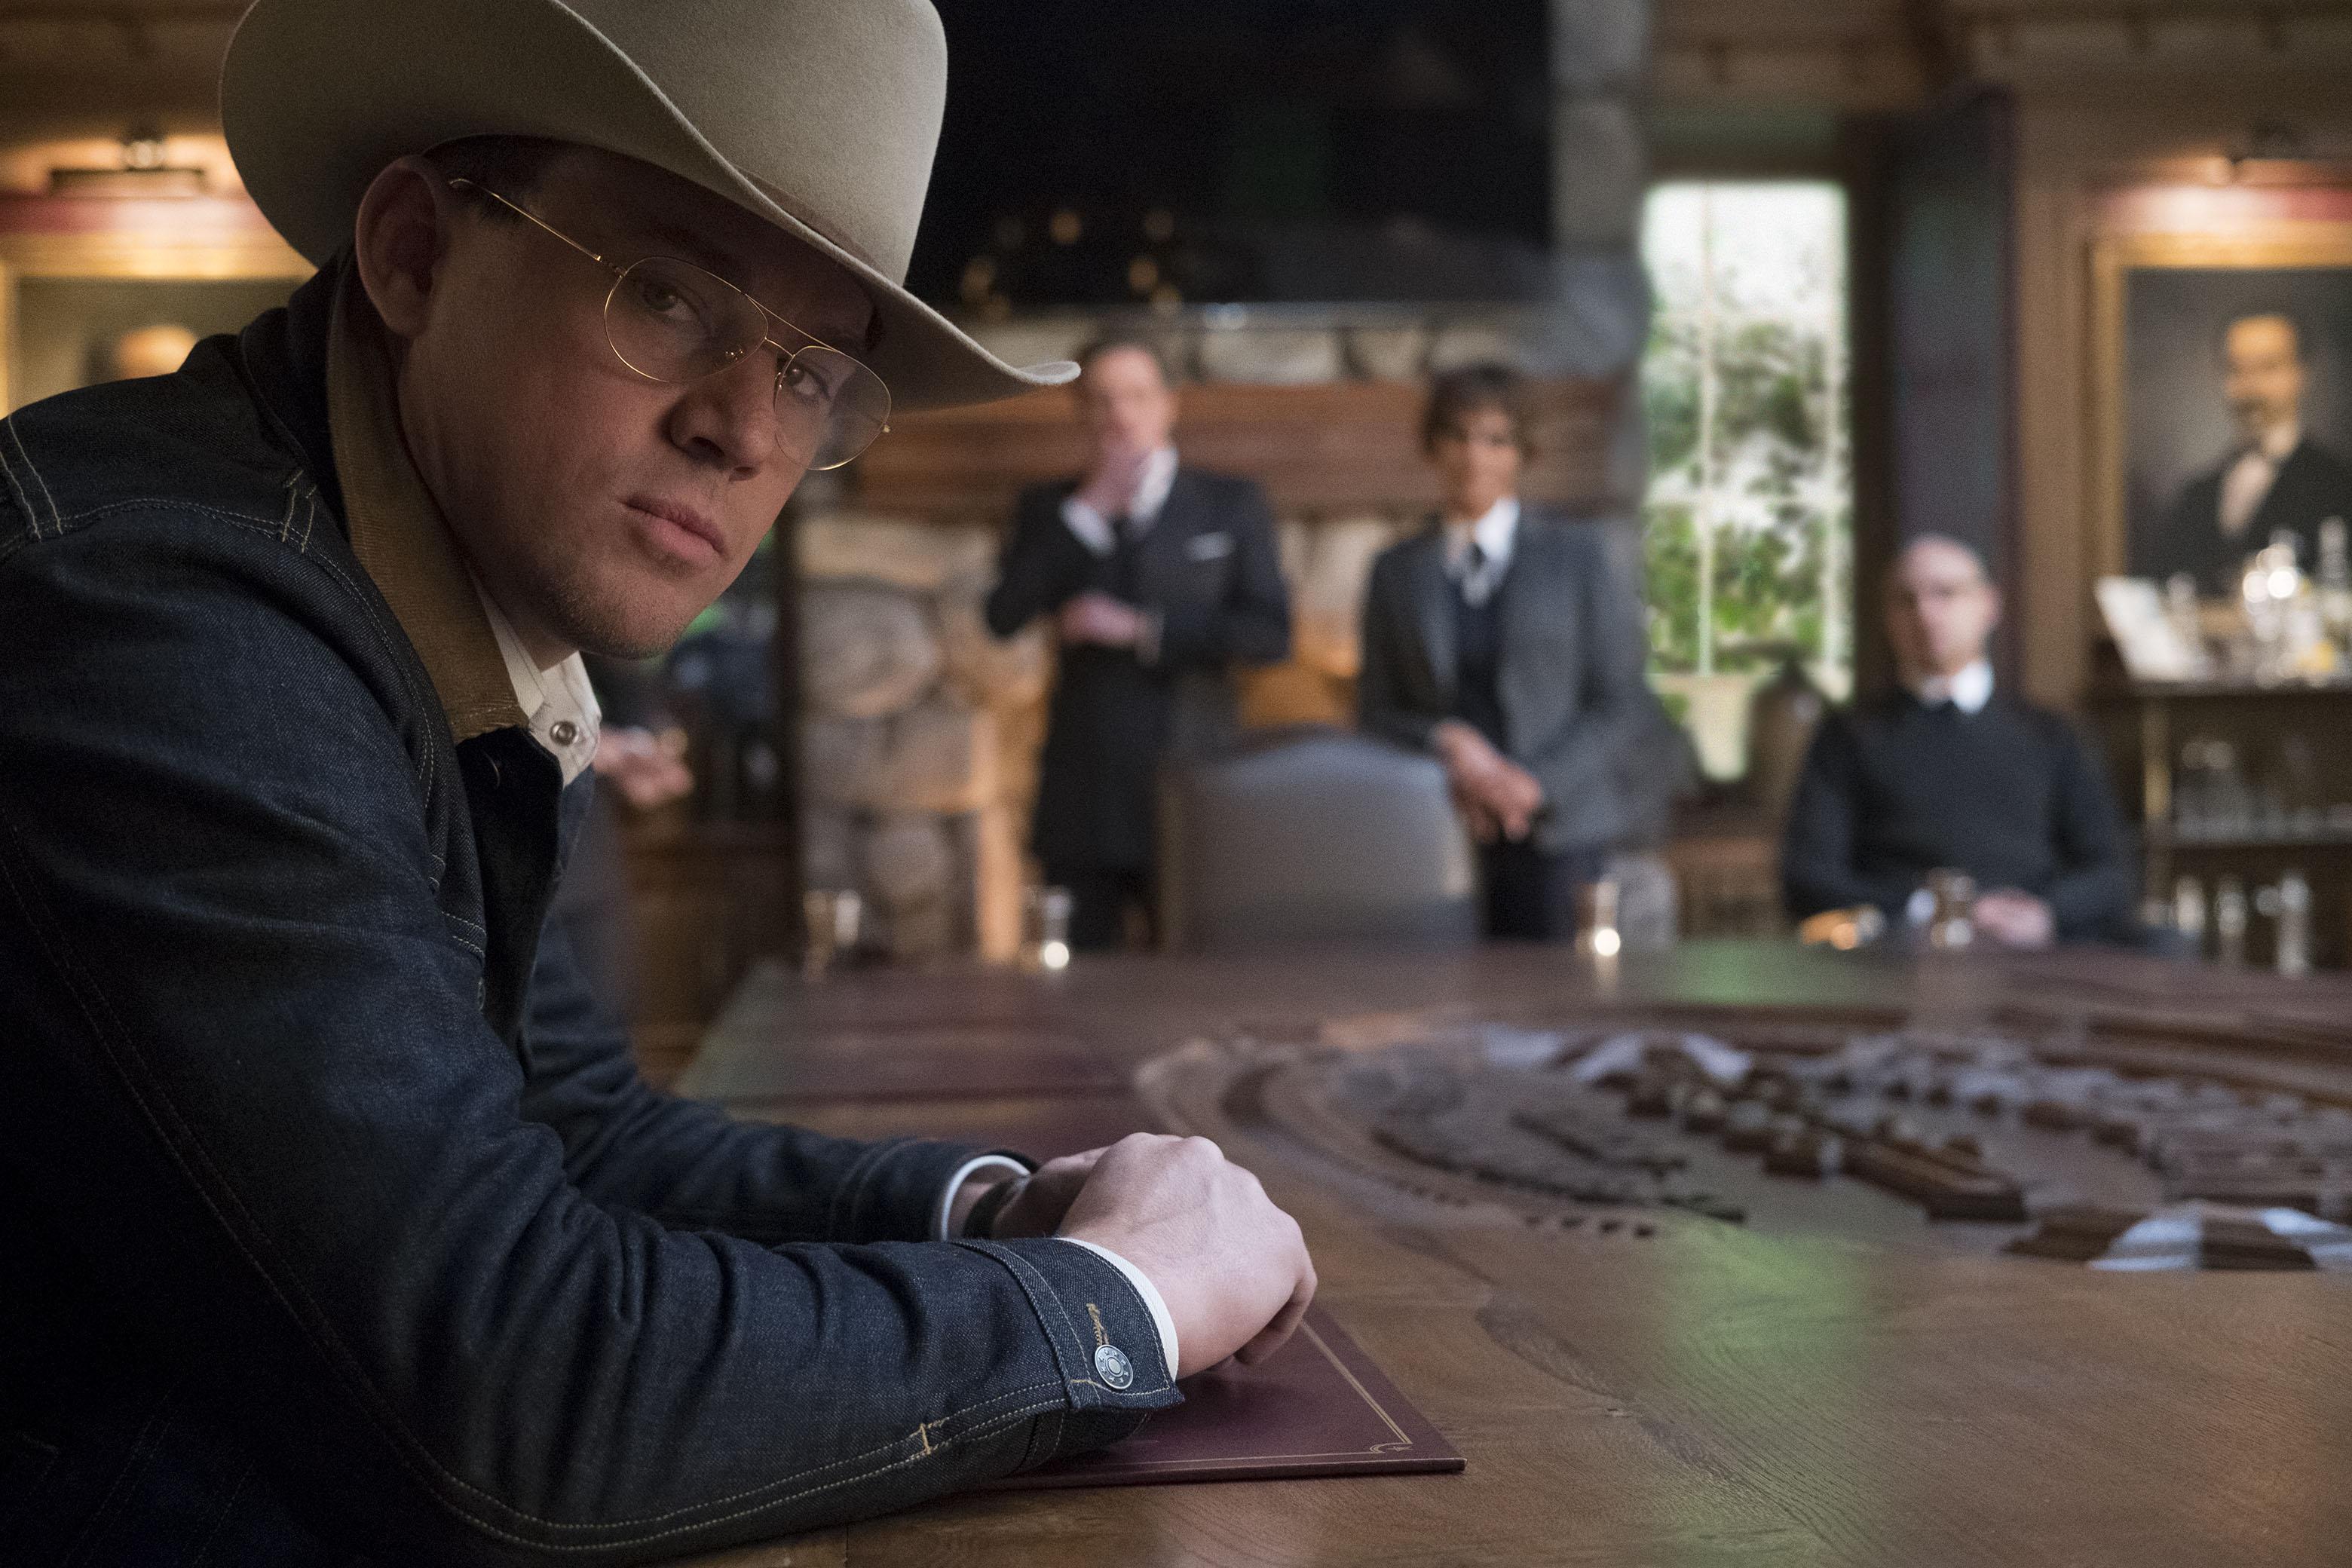 "DF-09632_r - Channing Tatum stars in Twentieth Century Fox's ""Kingsman: The Golden Circle,"" also starring Colin Firth, julianne Moore, Taron Egerton, Mark Strong, Elton John, Halle Berry and Jeff Bridges. Photo Credit: Giles Keyte."